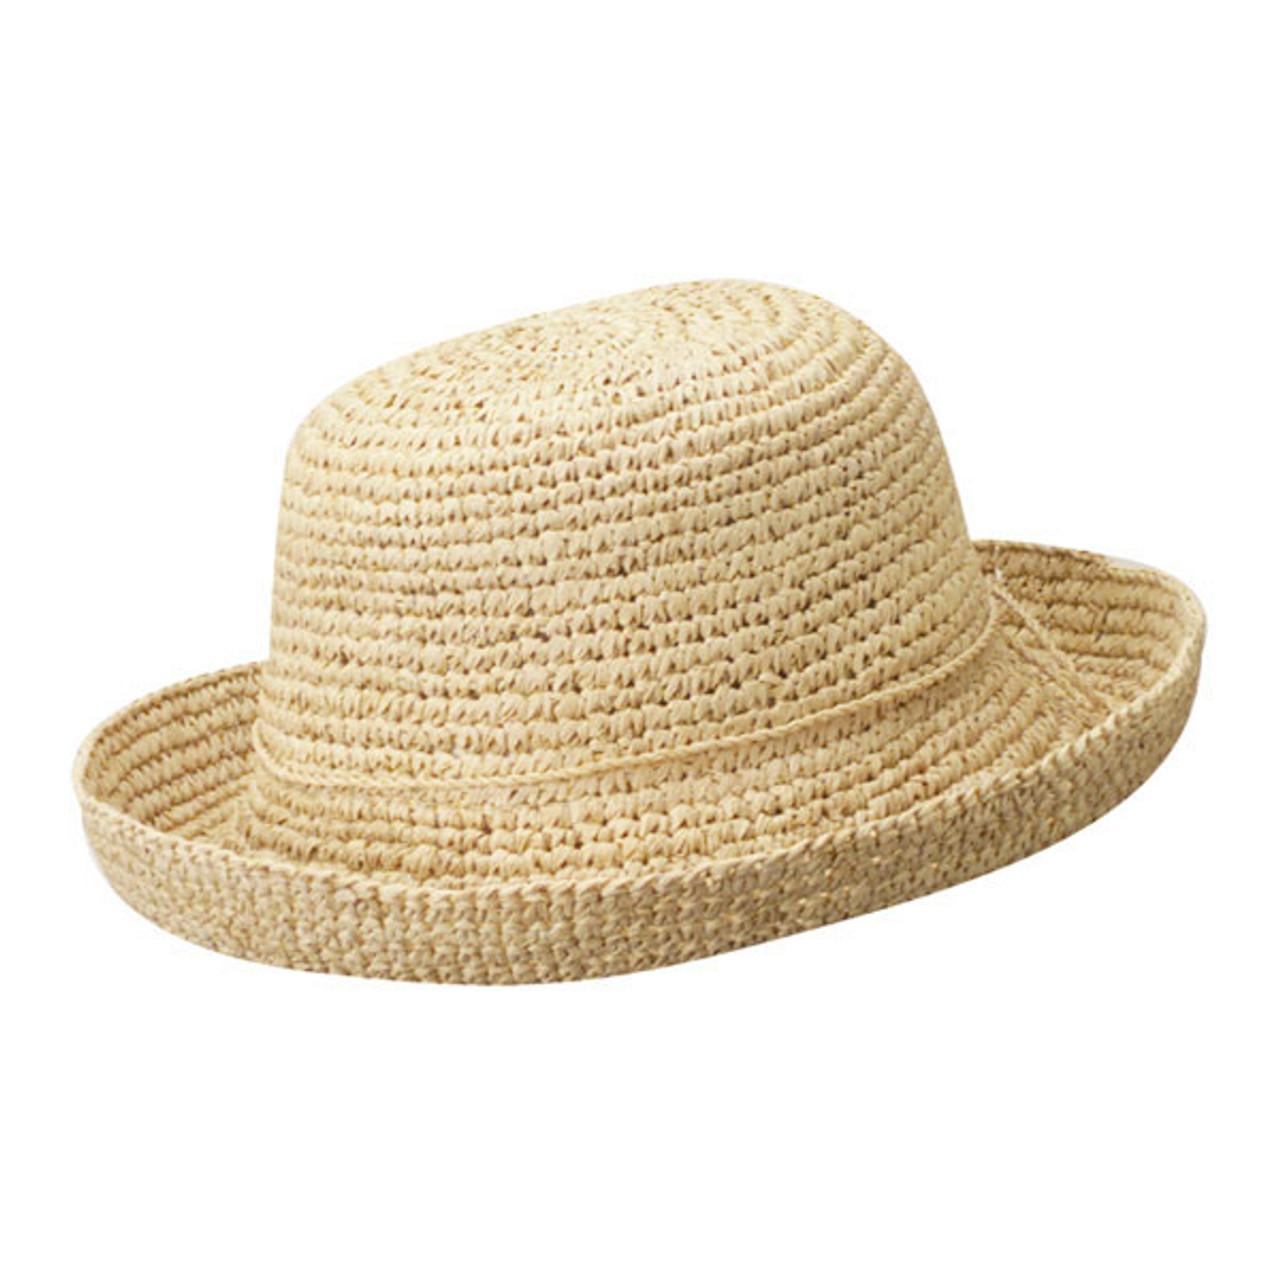 77859f89e8d9c7 Dorfman Pacific | Crochet Raffia Sun Hat | Hats Unlimited